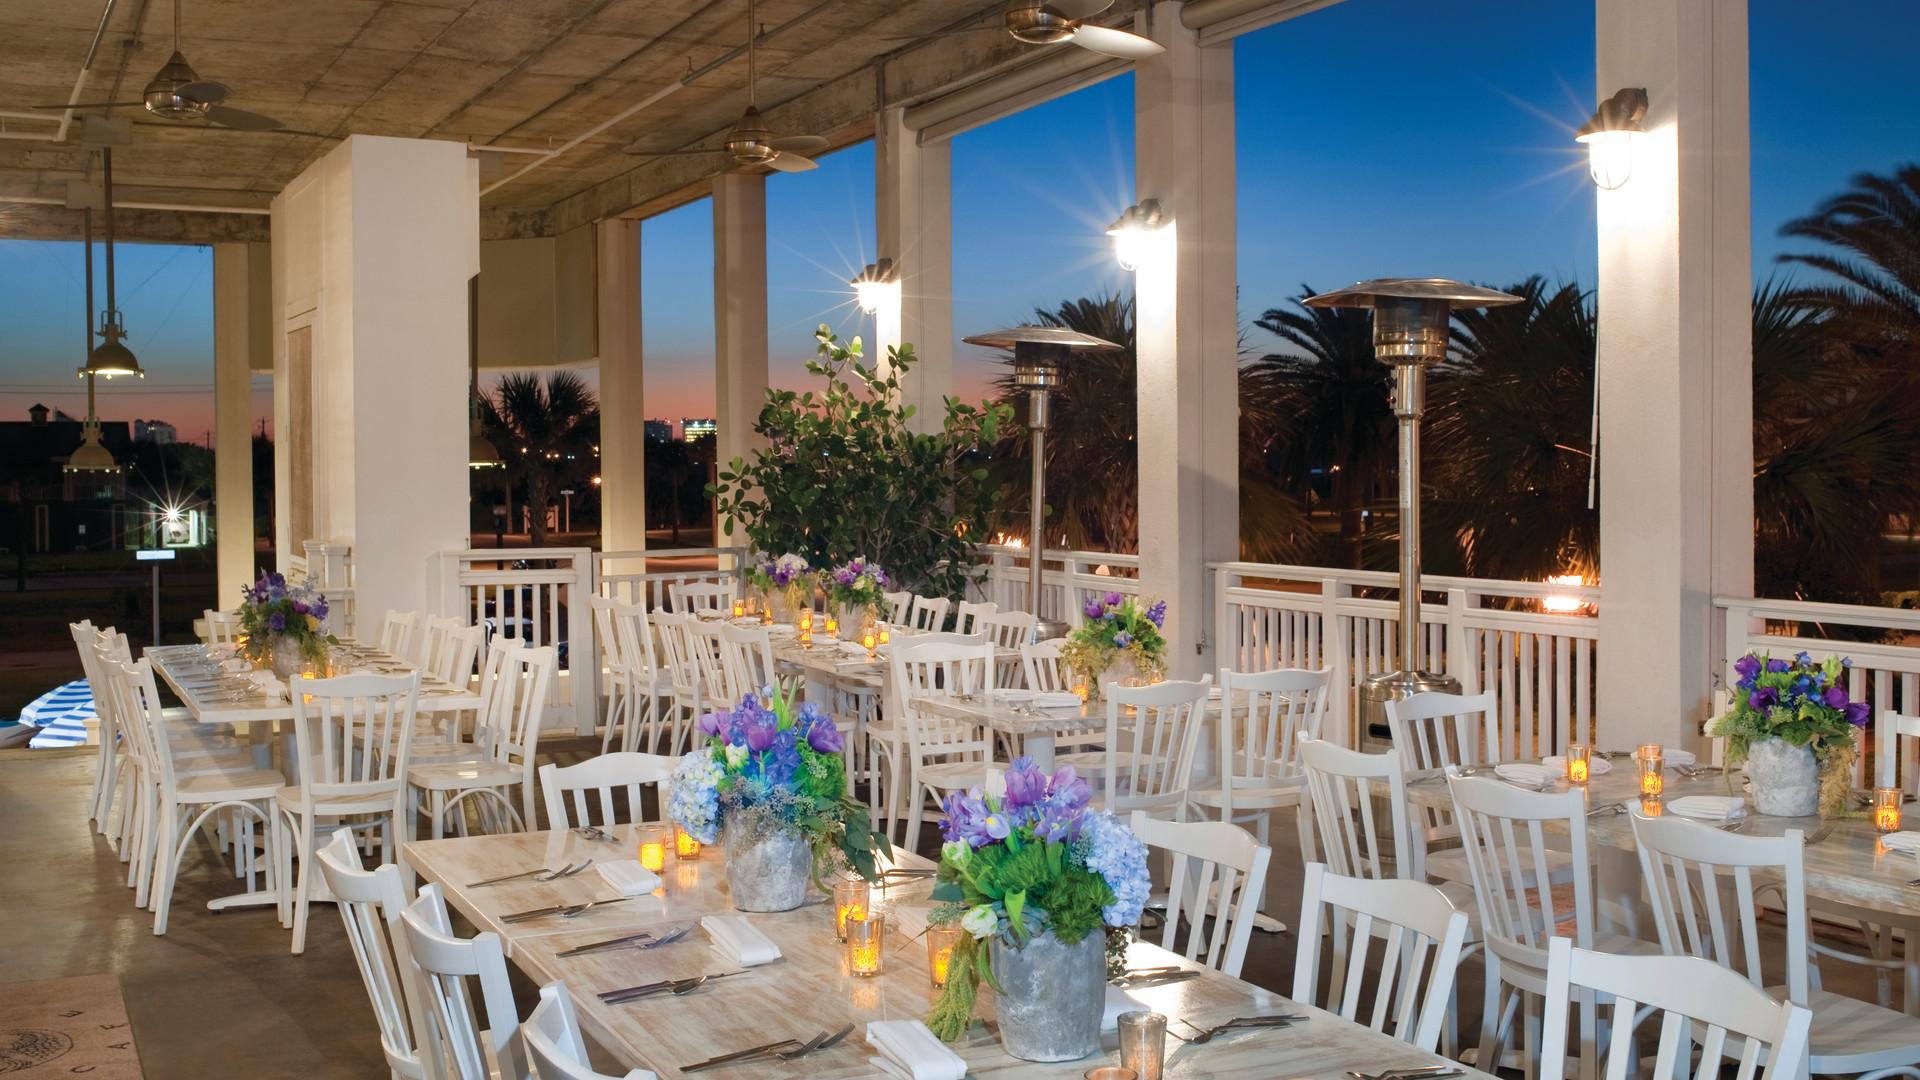 Porch Cafe Backdrop3.jpg